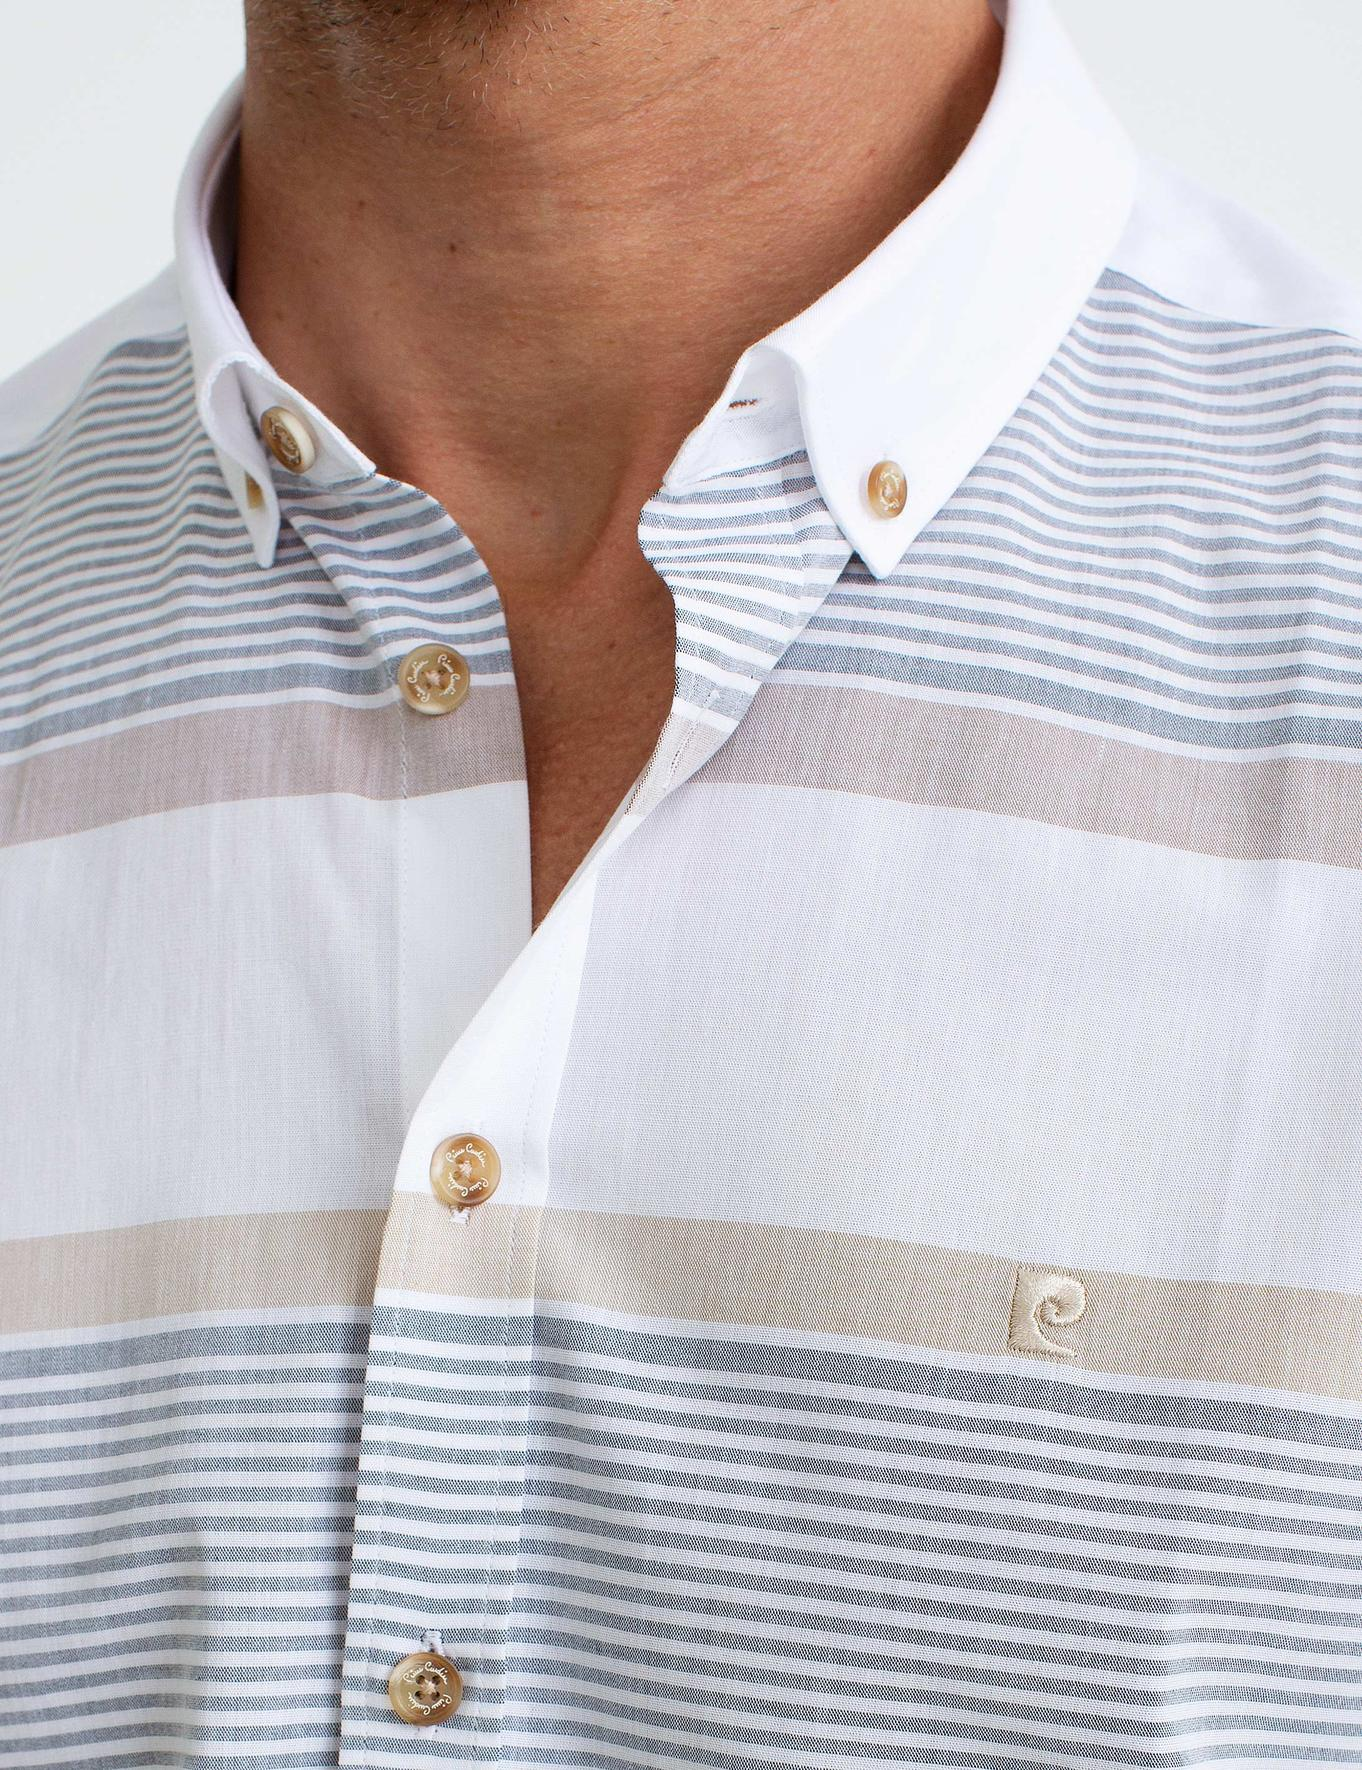 Turuncu Detaylı Beyaz Slim Fit Kısakol Gömlek